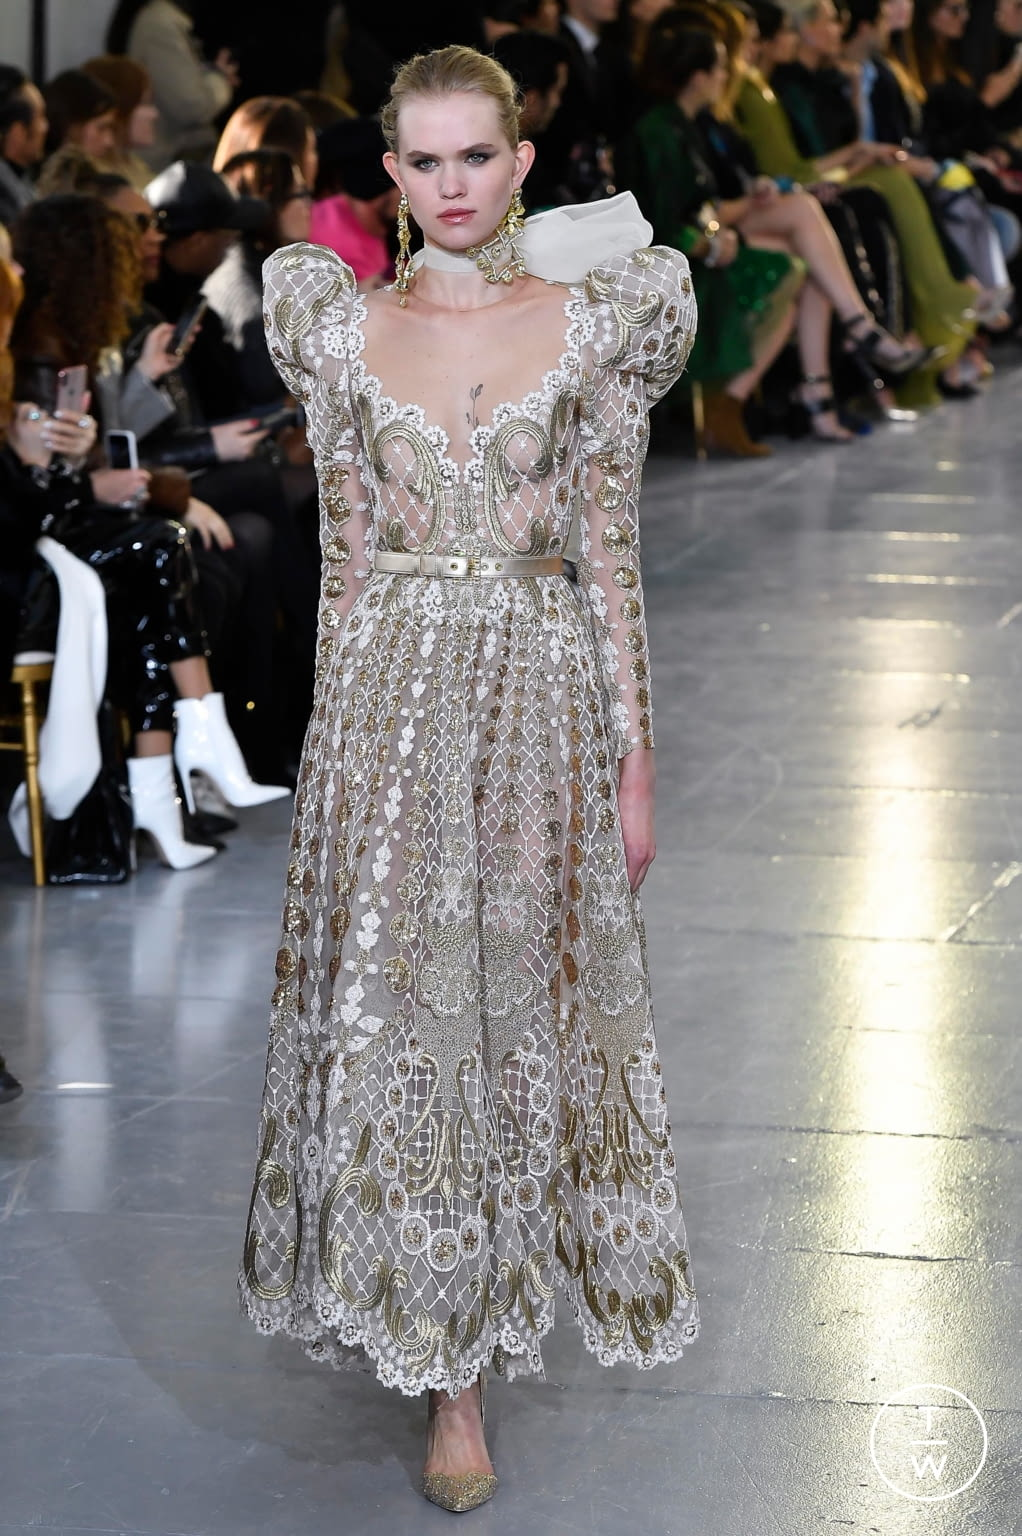 Elie Saab Ss20 Couture 22 The Fashion Search Engine Tagwalk